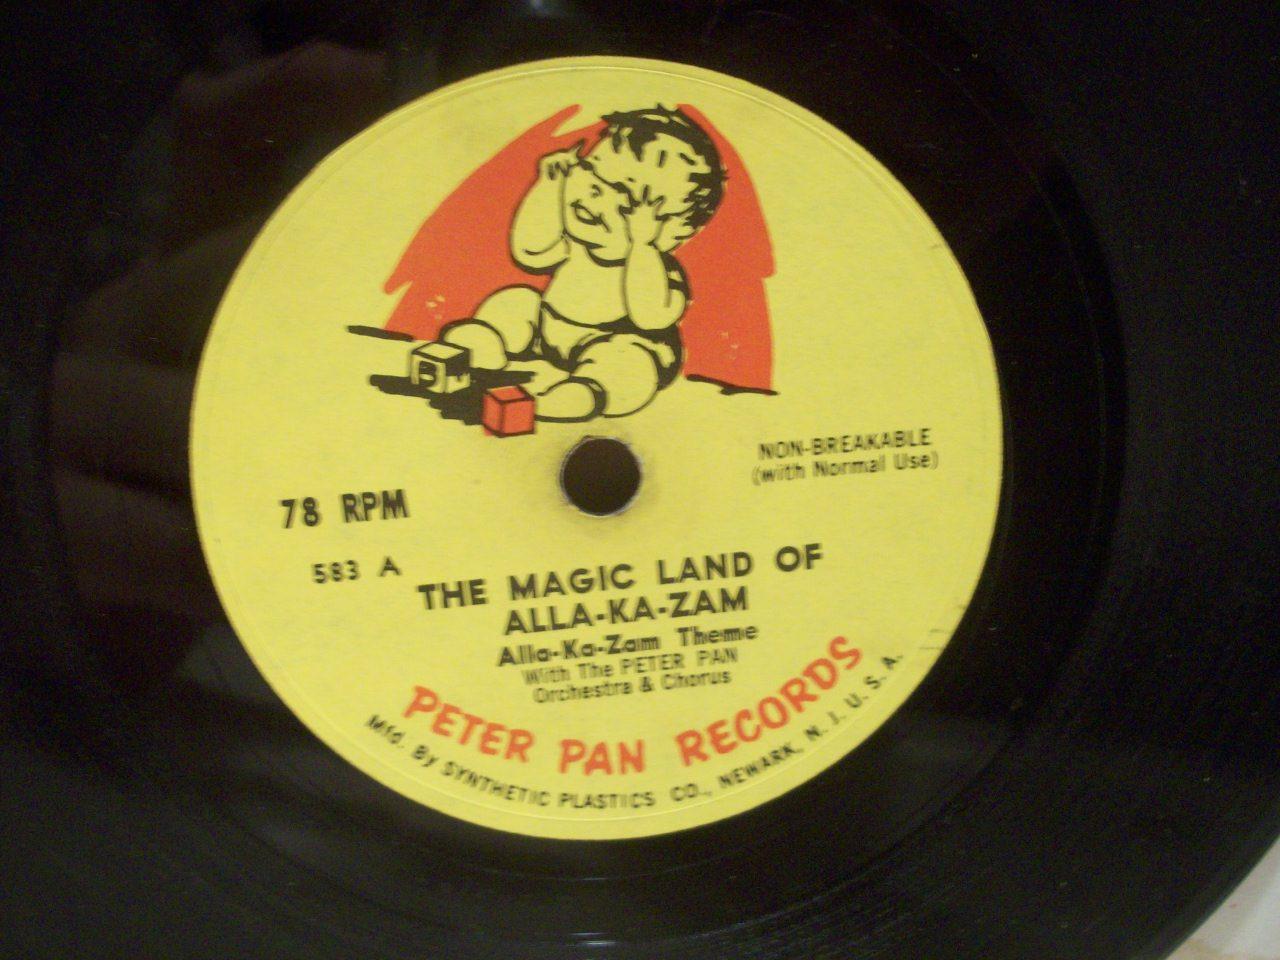 Wilson, Marc 78 Rpm Signed Autograph The Magic Land Of Alla Ka Zam 1962